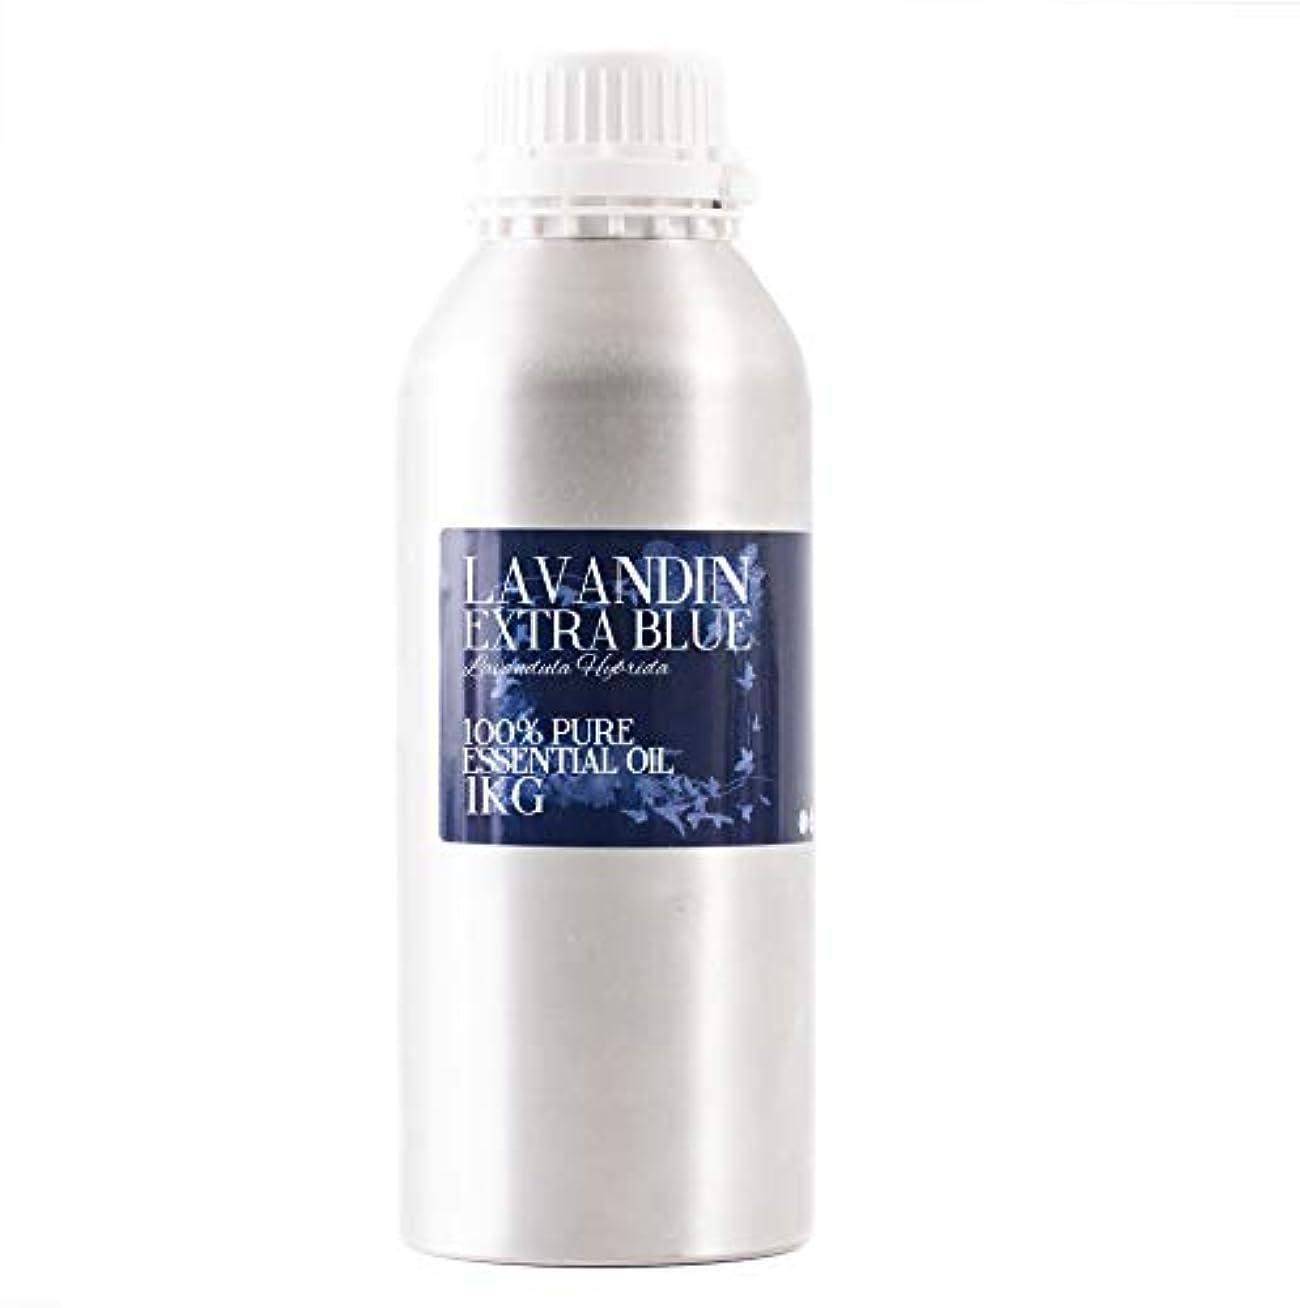 地下頂点反乱Mystic Moments | Lavandin Extra Blue Essential Oil - 1Kg - 100% Pure